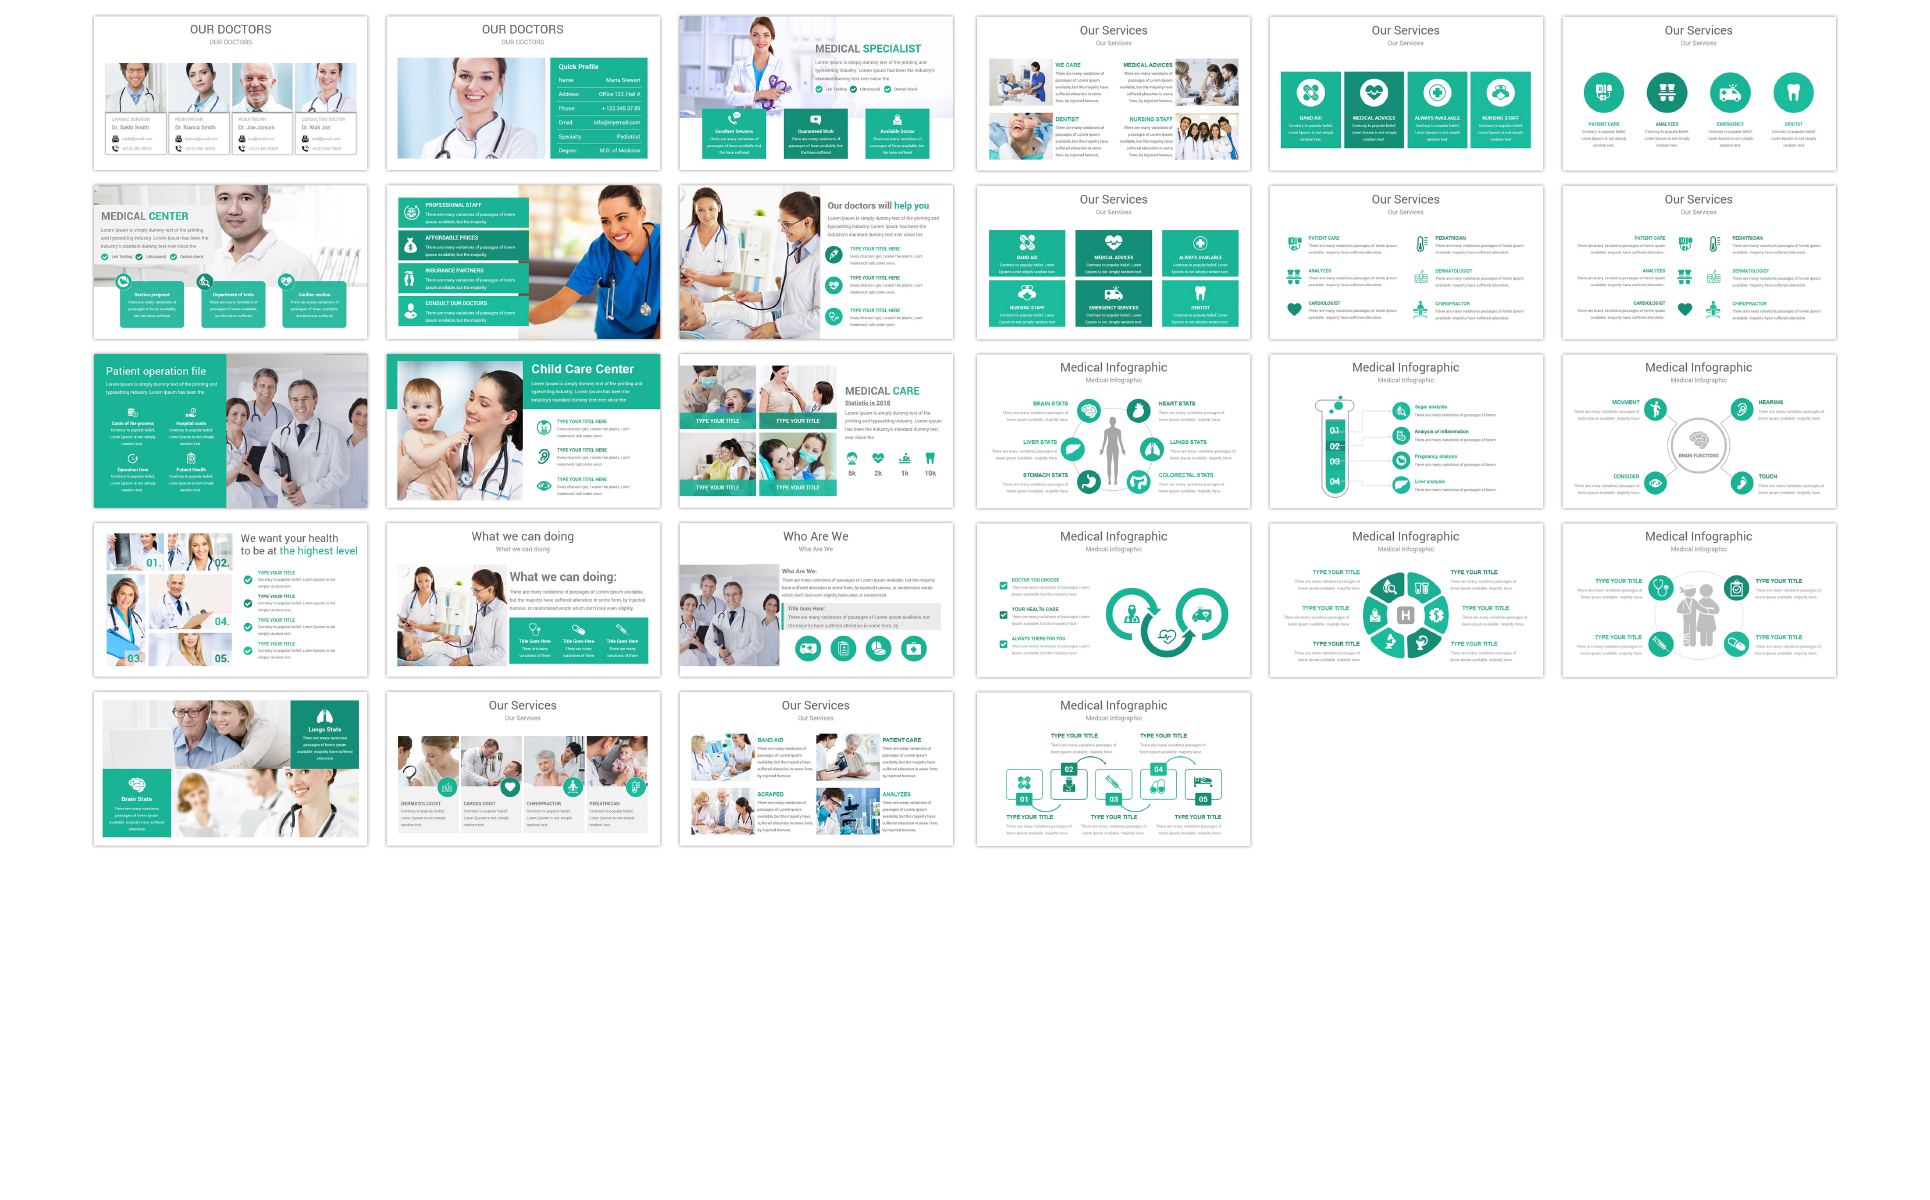 Medical and healthcare presentation powerpoint template 71817 medical and healthcare presentation powerpoint template big screenshot toneelgroepblik Choice Image